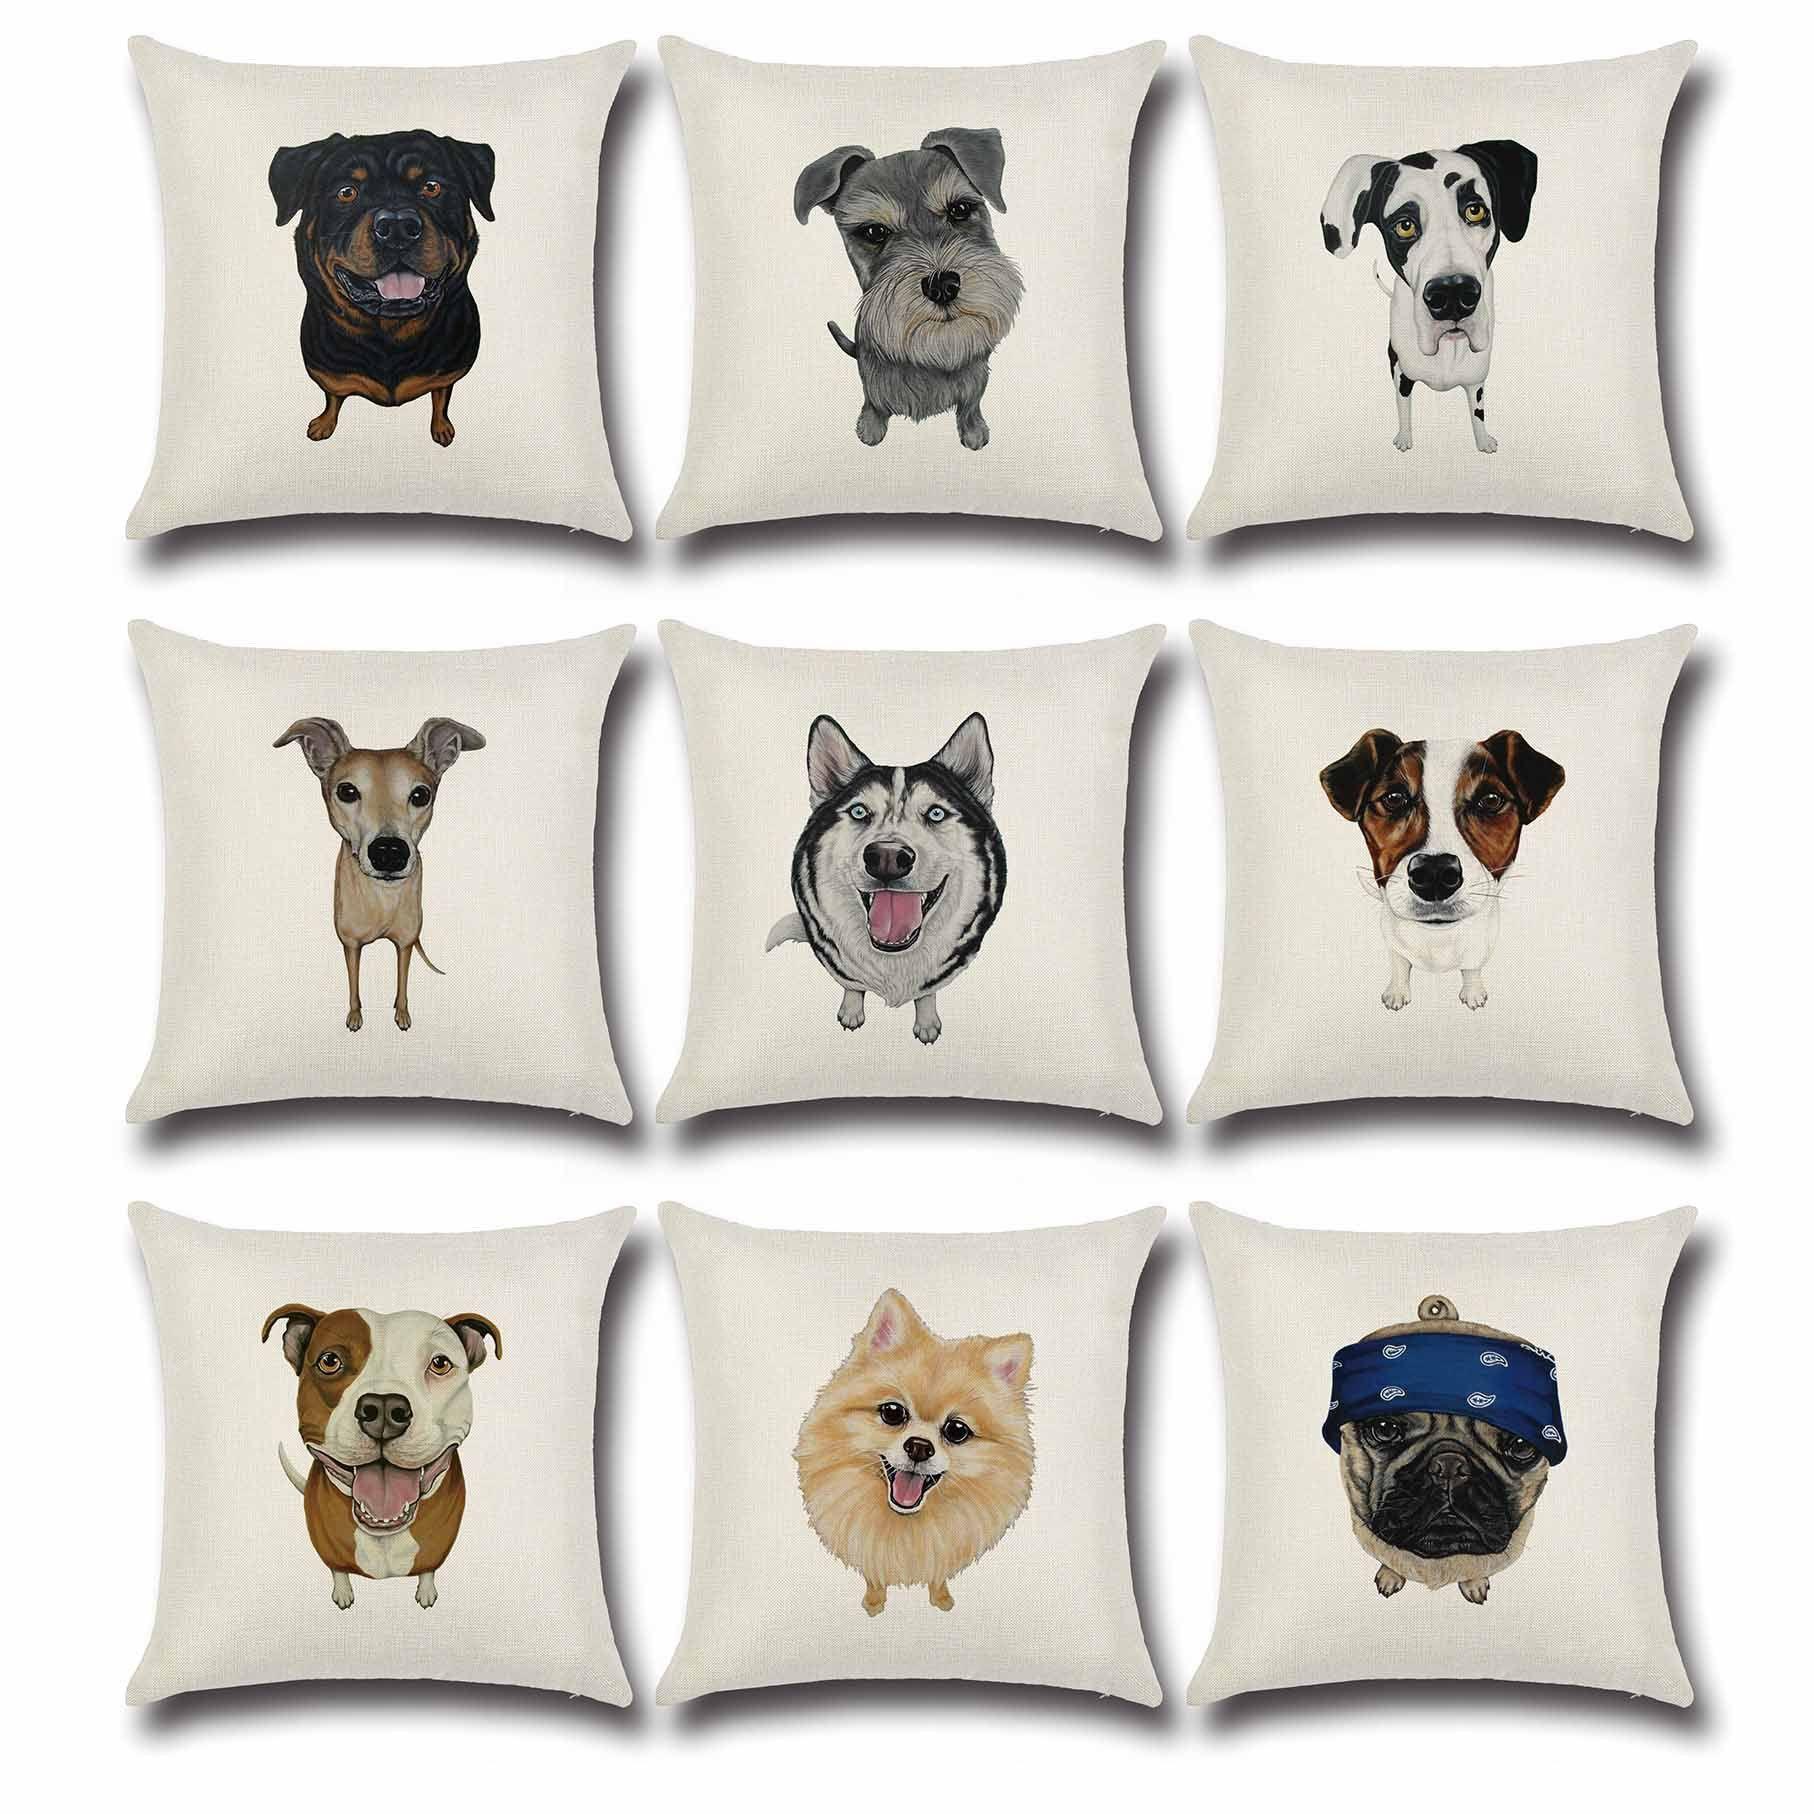 Cushion Cover Lovely Cute Pug Dog Pillowcases Cotton Linen Printed ...